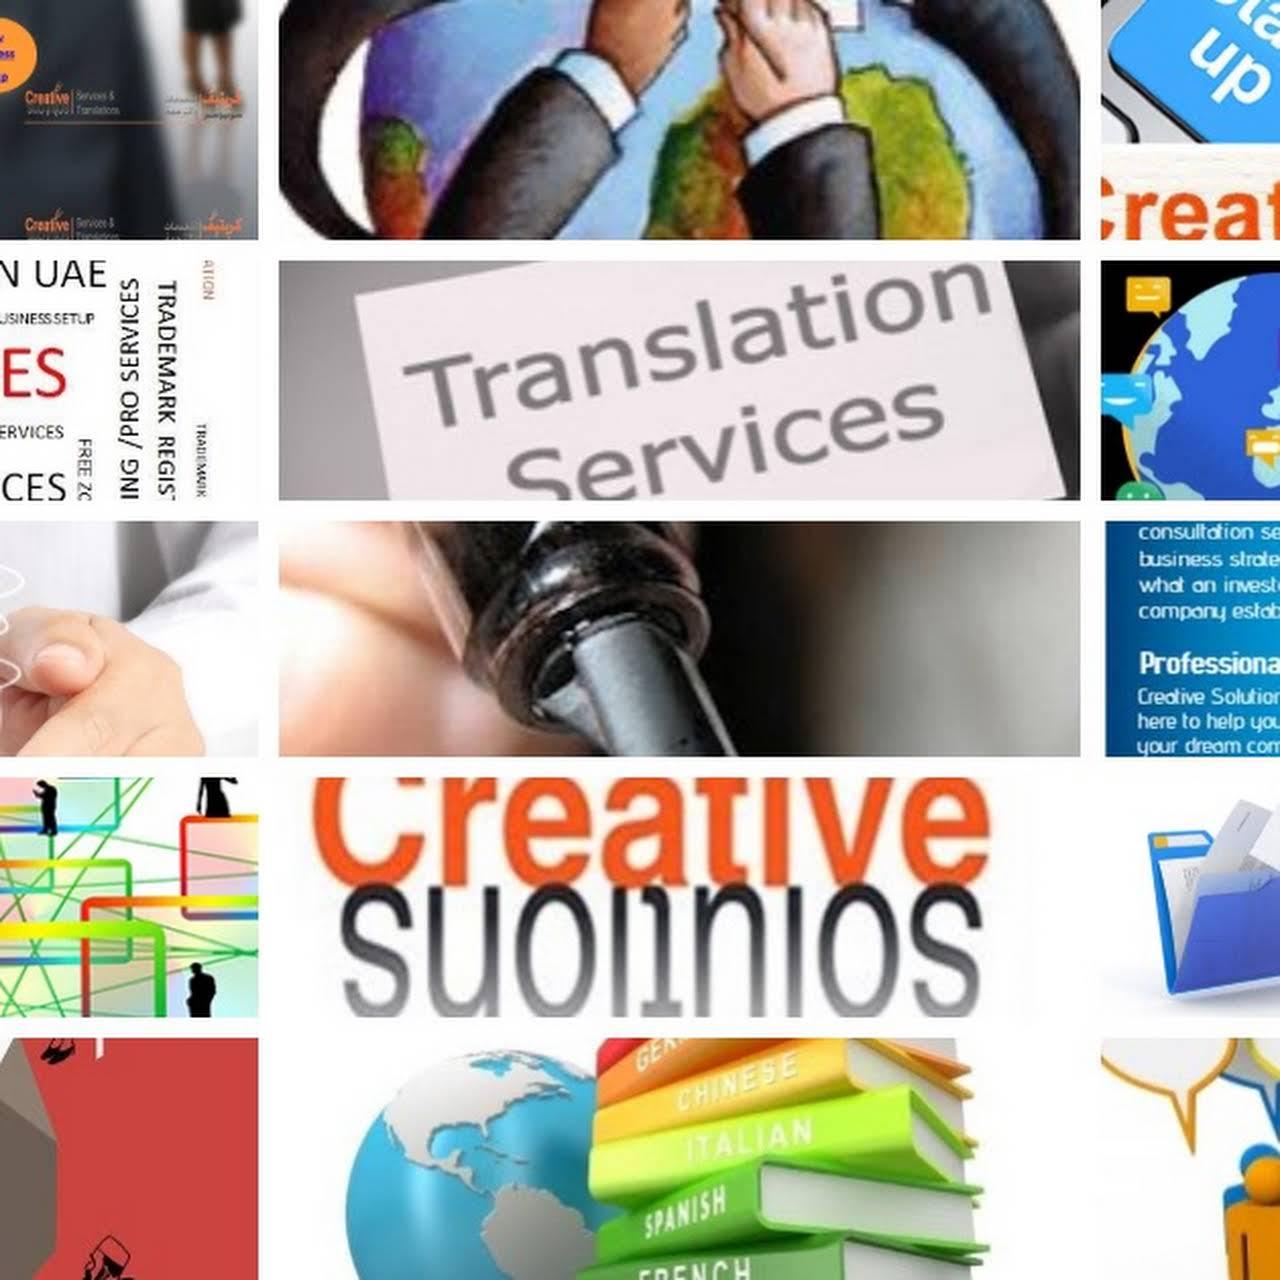 CREATIVE SOLUTIONS SERVICES & TRANSLATION L L C - Translator in Dubai